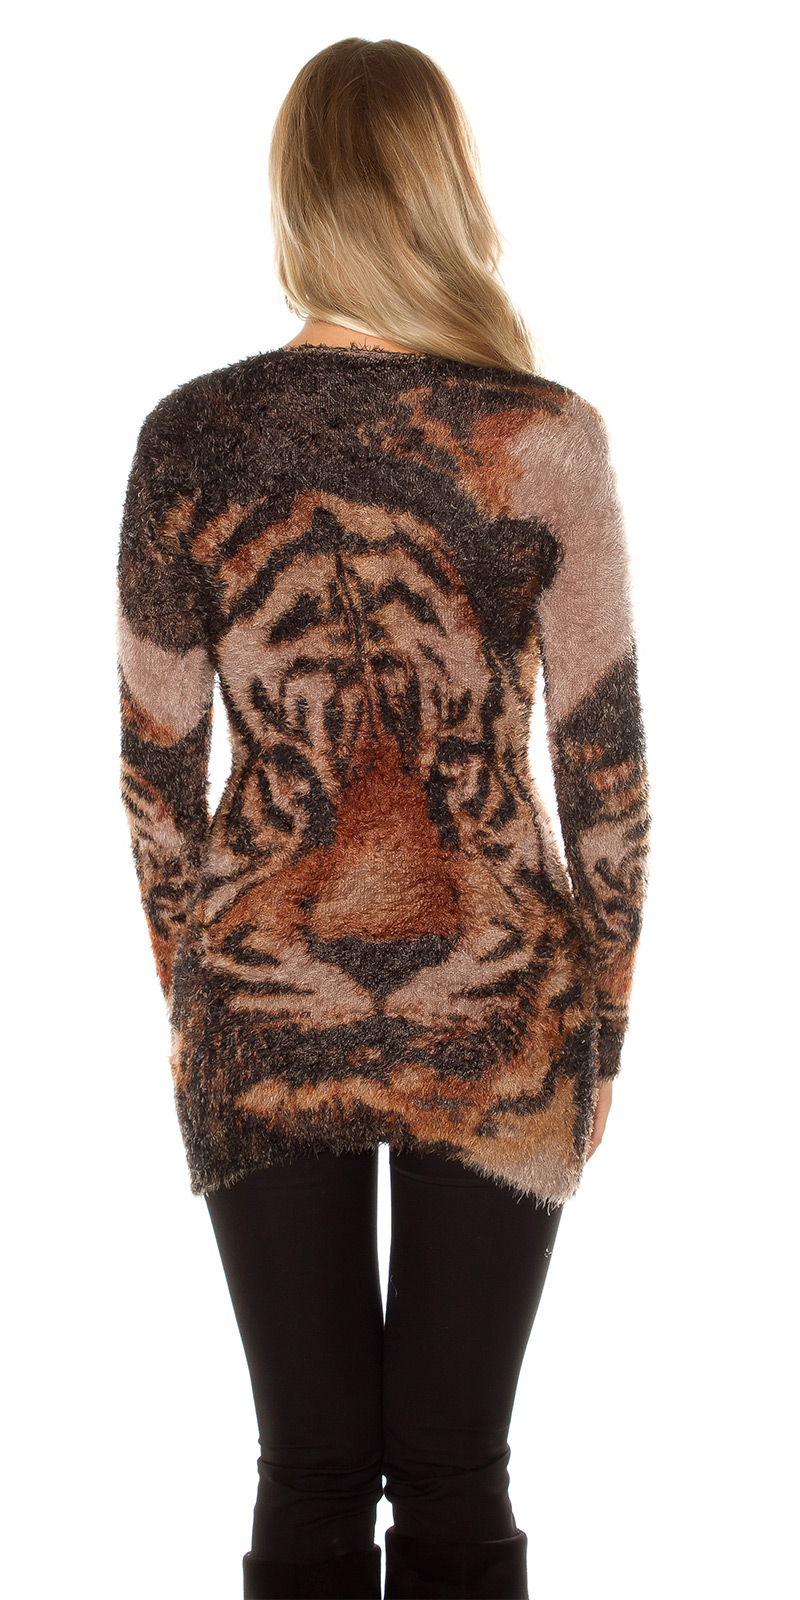 Pulover lung la moda fleecy cu tiger imprimeu